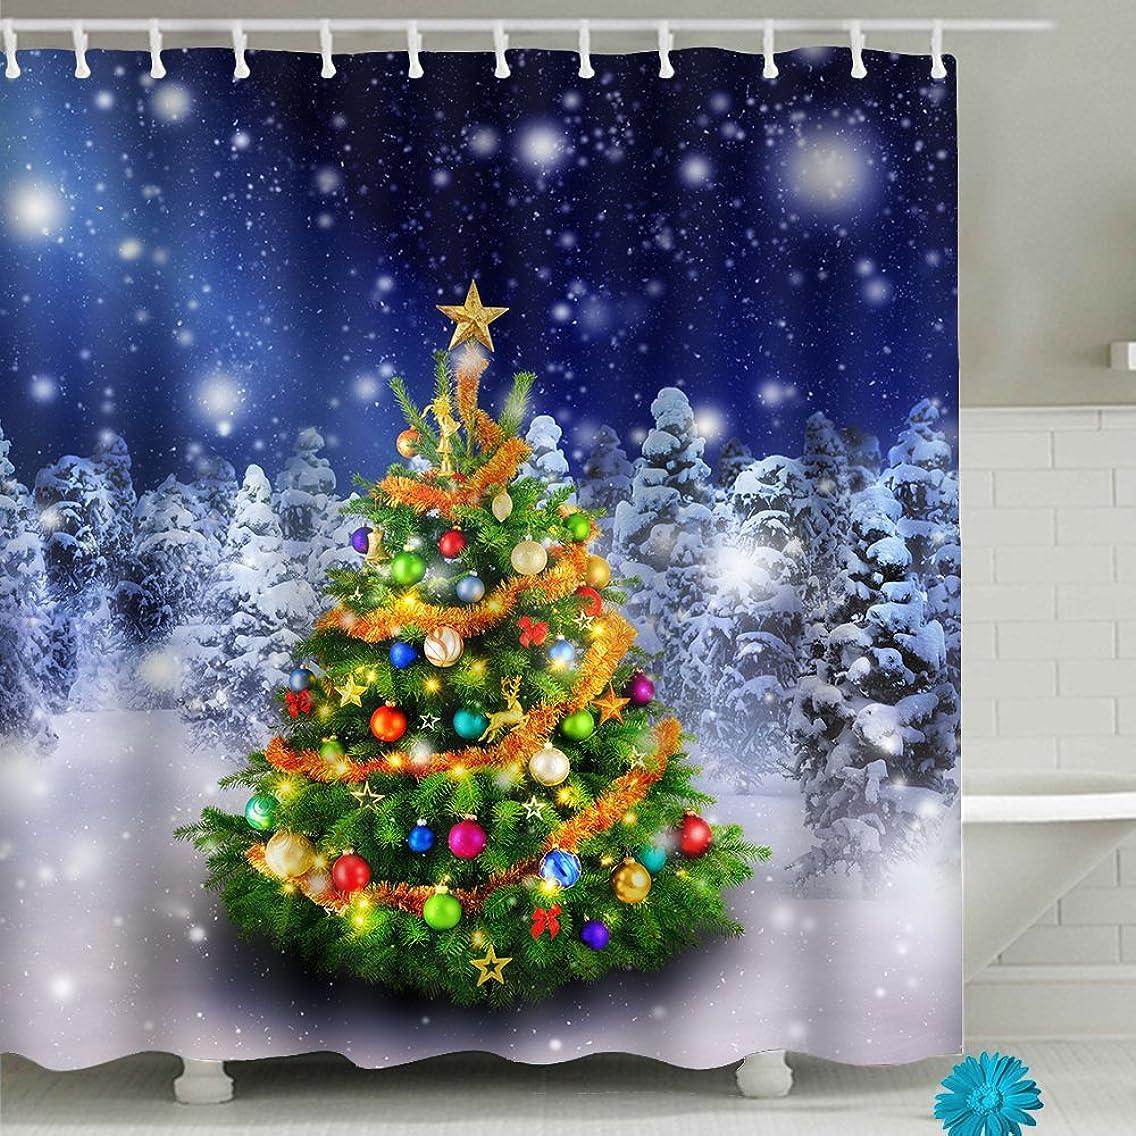 "FAITOVE Merry Christmas Tree Bathroom Shower Curtain Sets Waterproof Decor 59"" x 71"" Polyester Fabric"